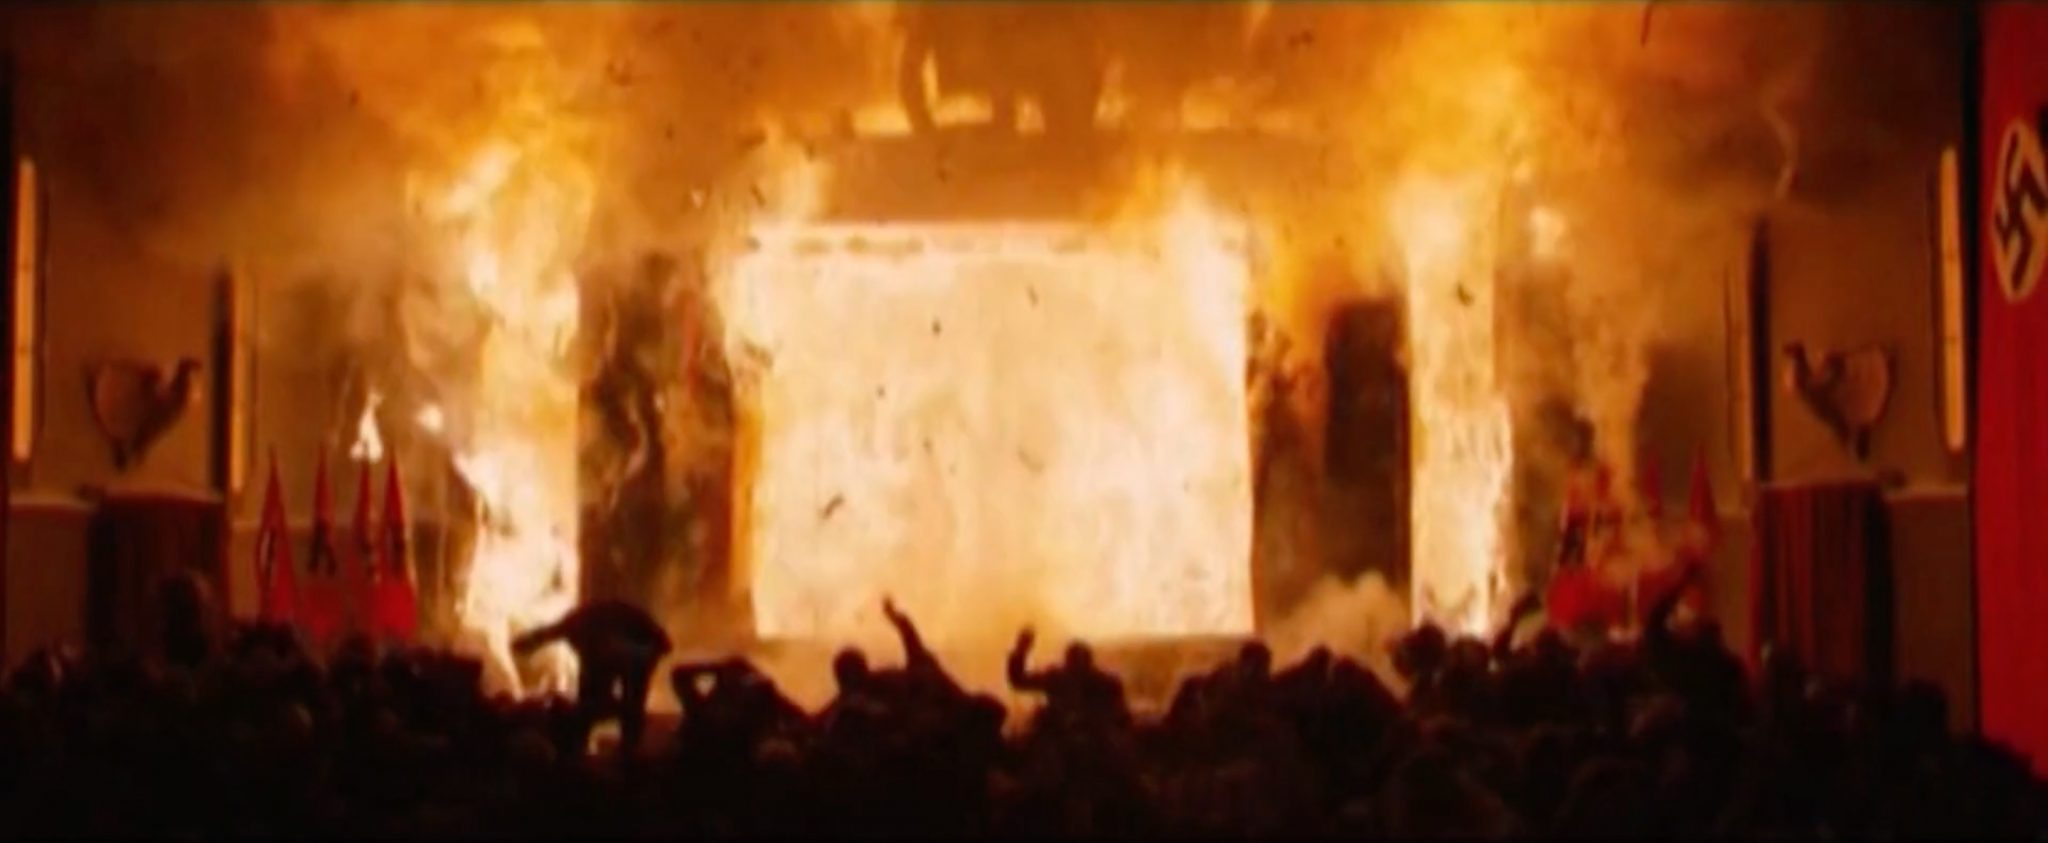 MG Action, Martin Goeres, Ingourious Basterds, Fire, Cinema